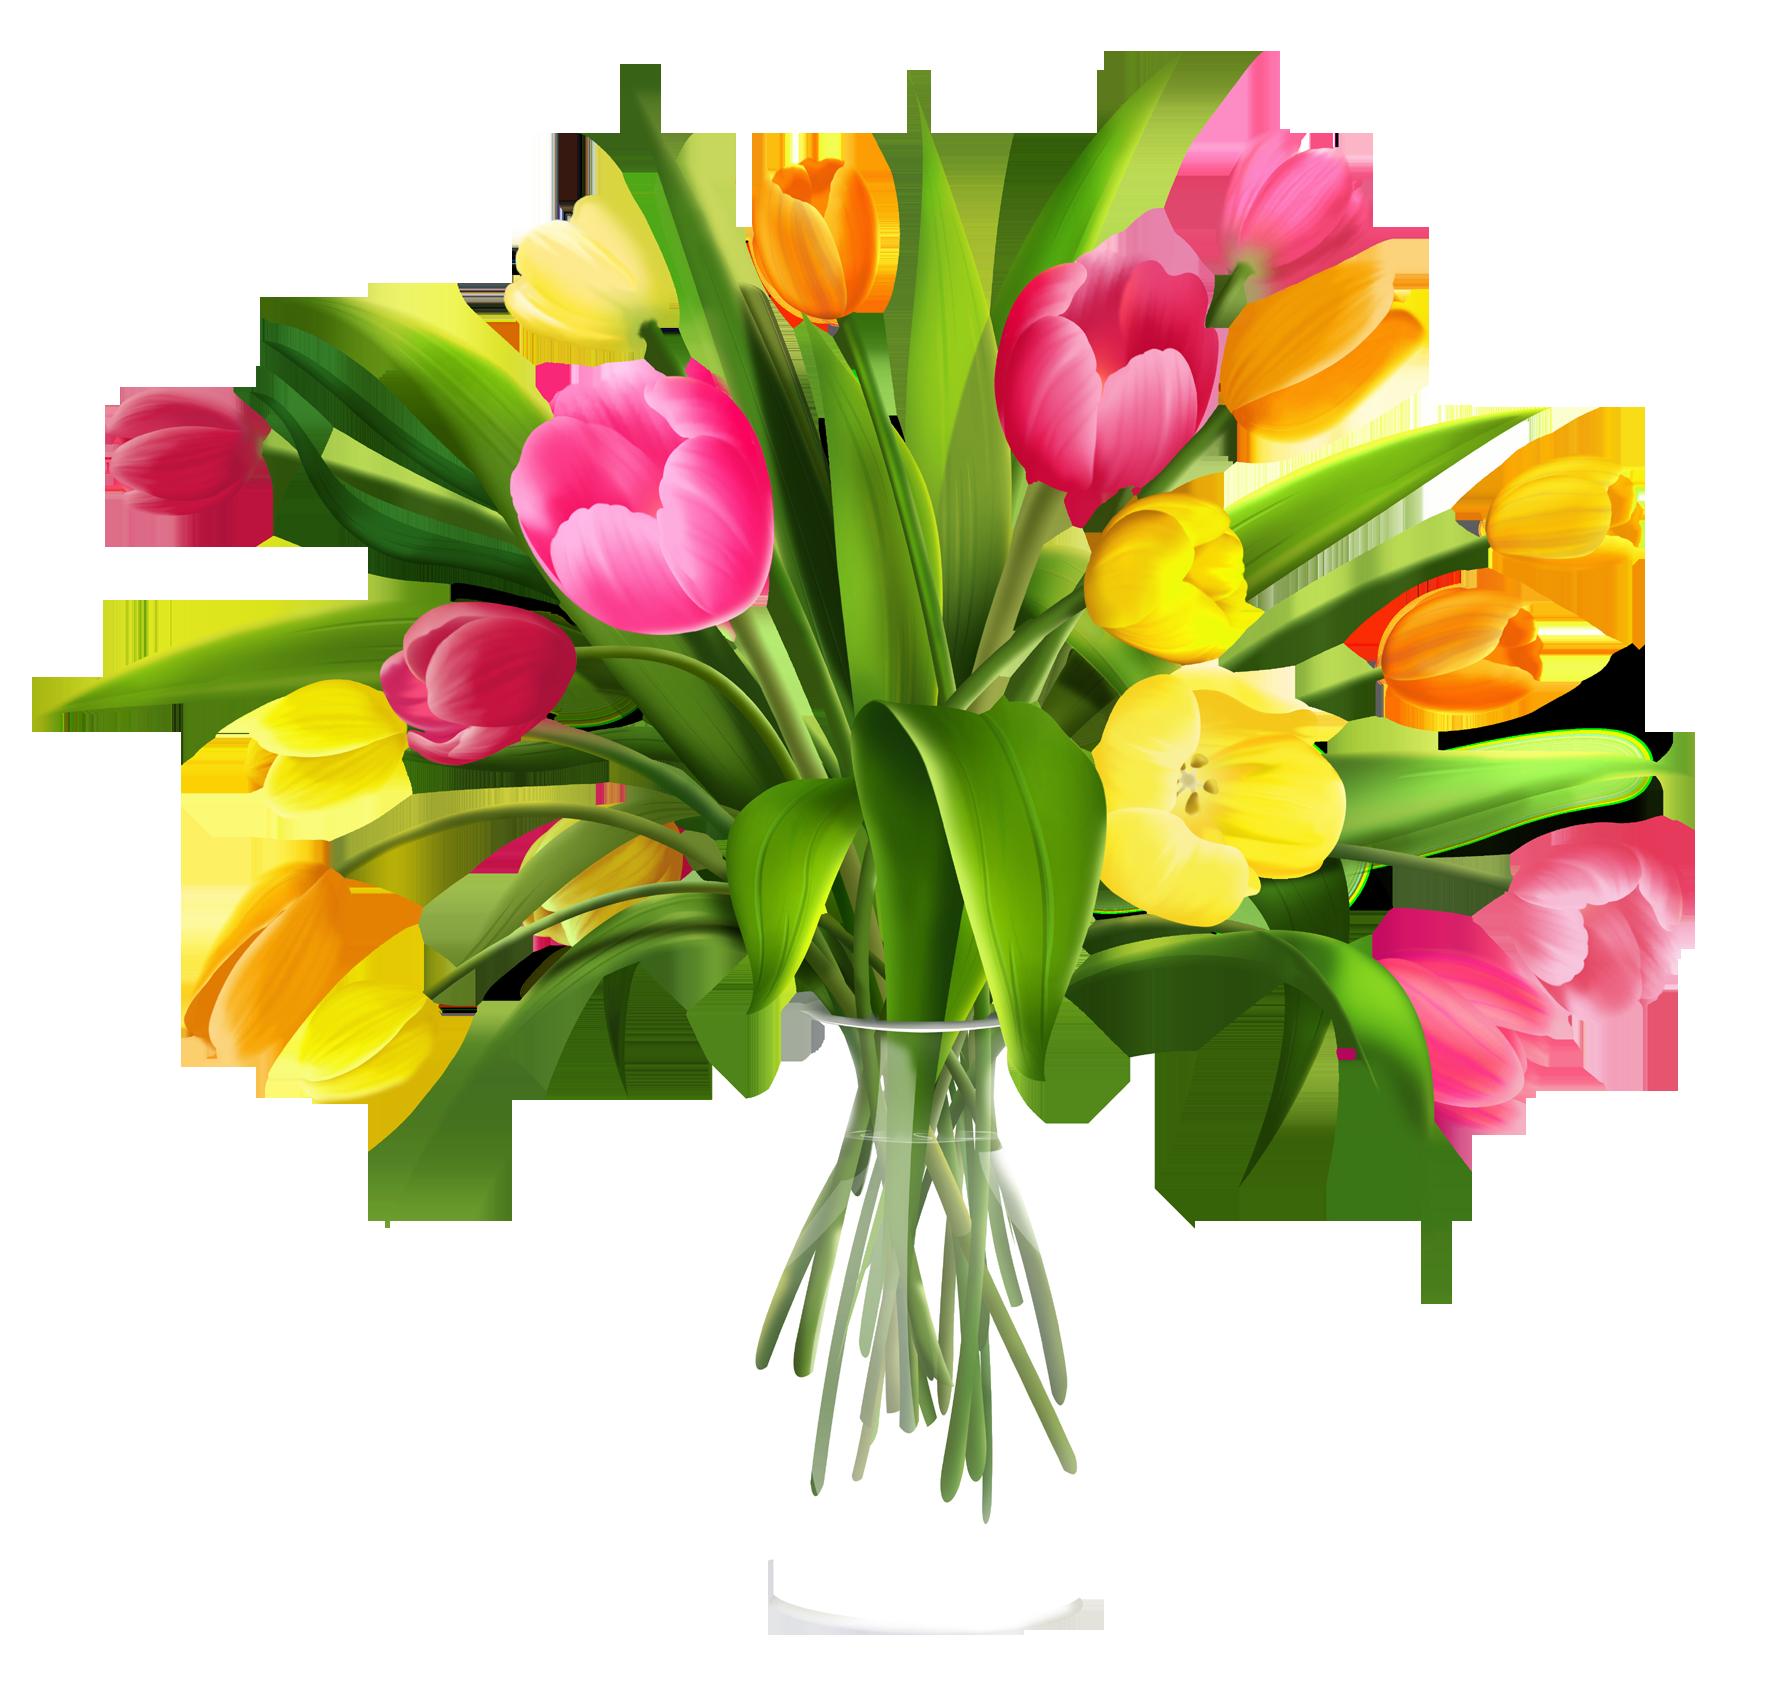 Vase Of Flowers Clipart.